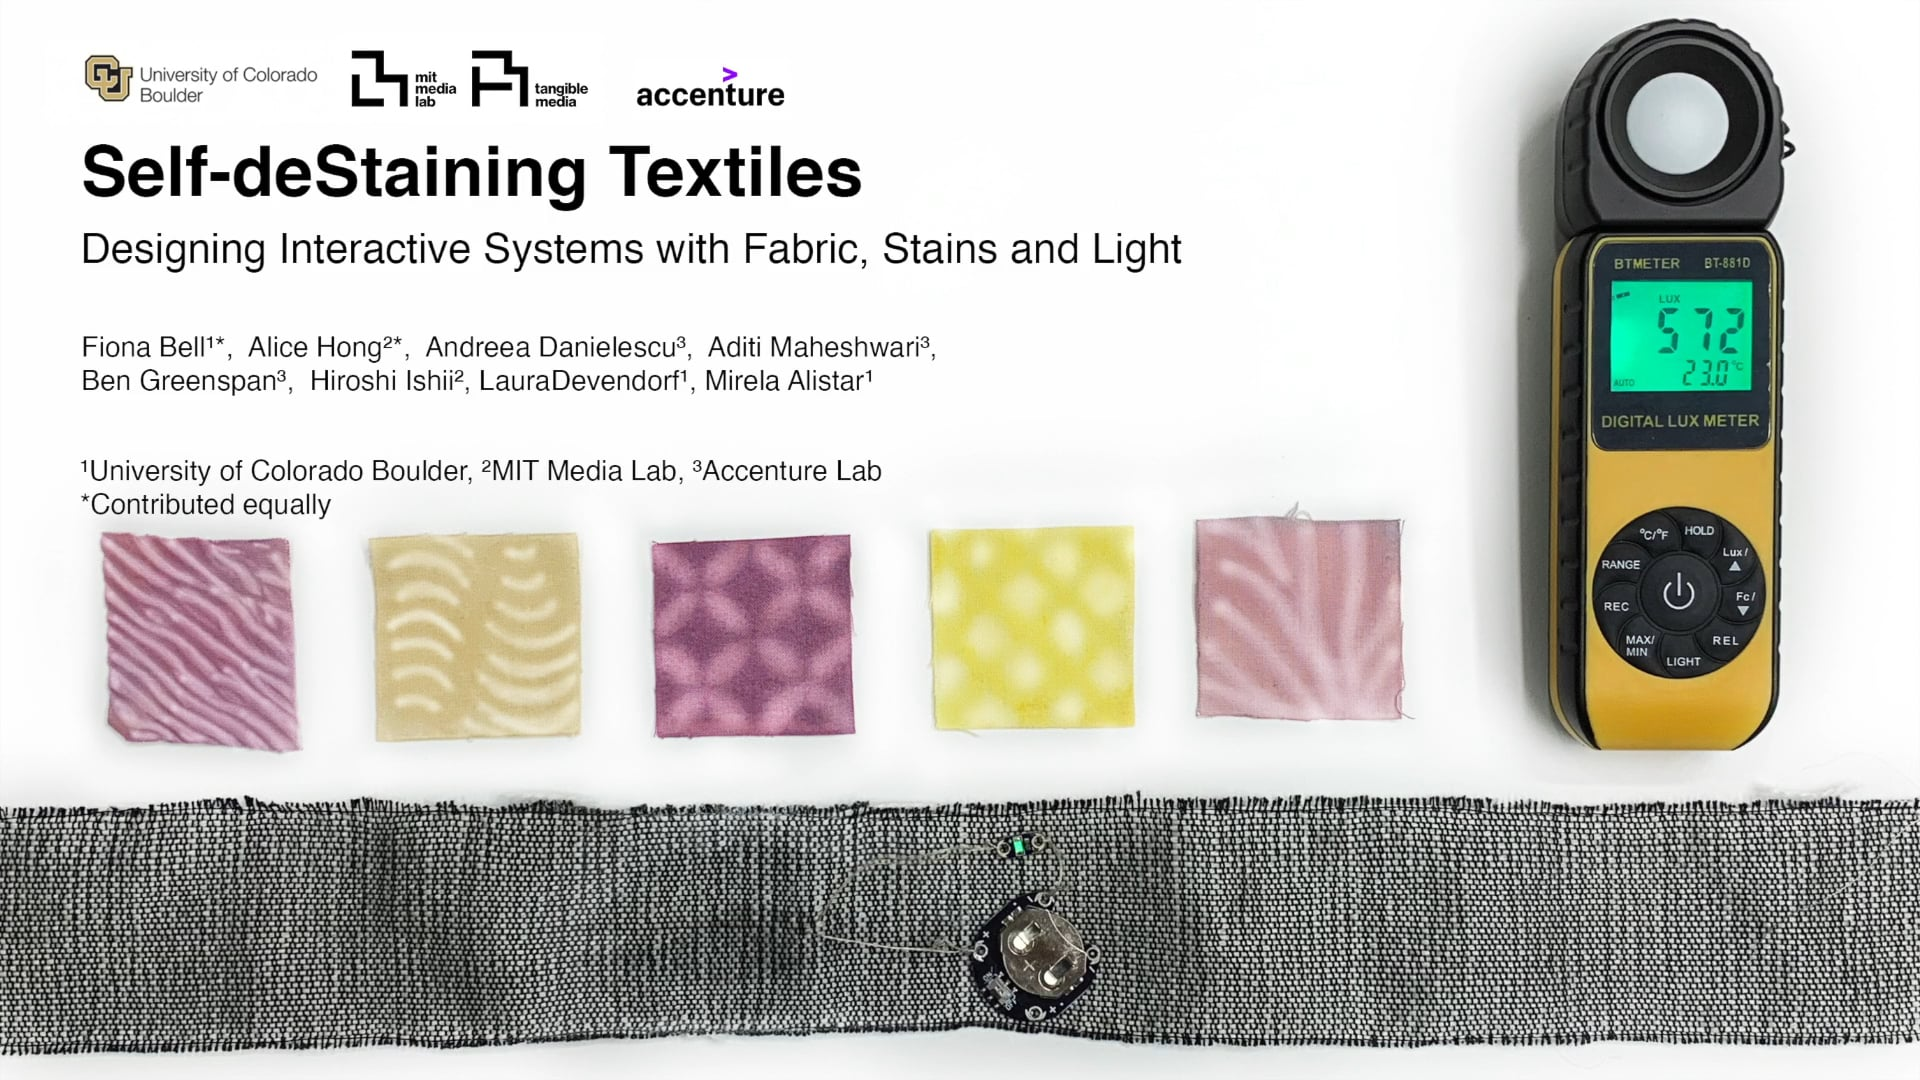 Self-deStaining Textiles